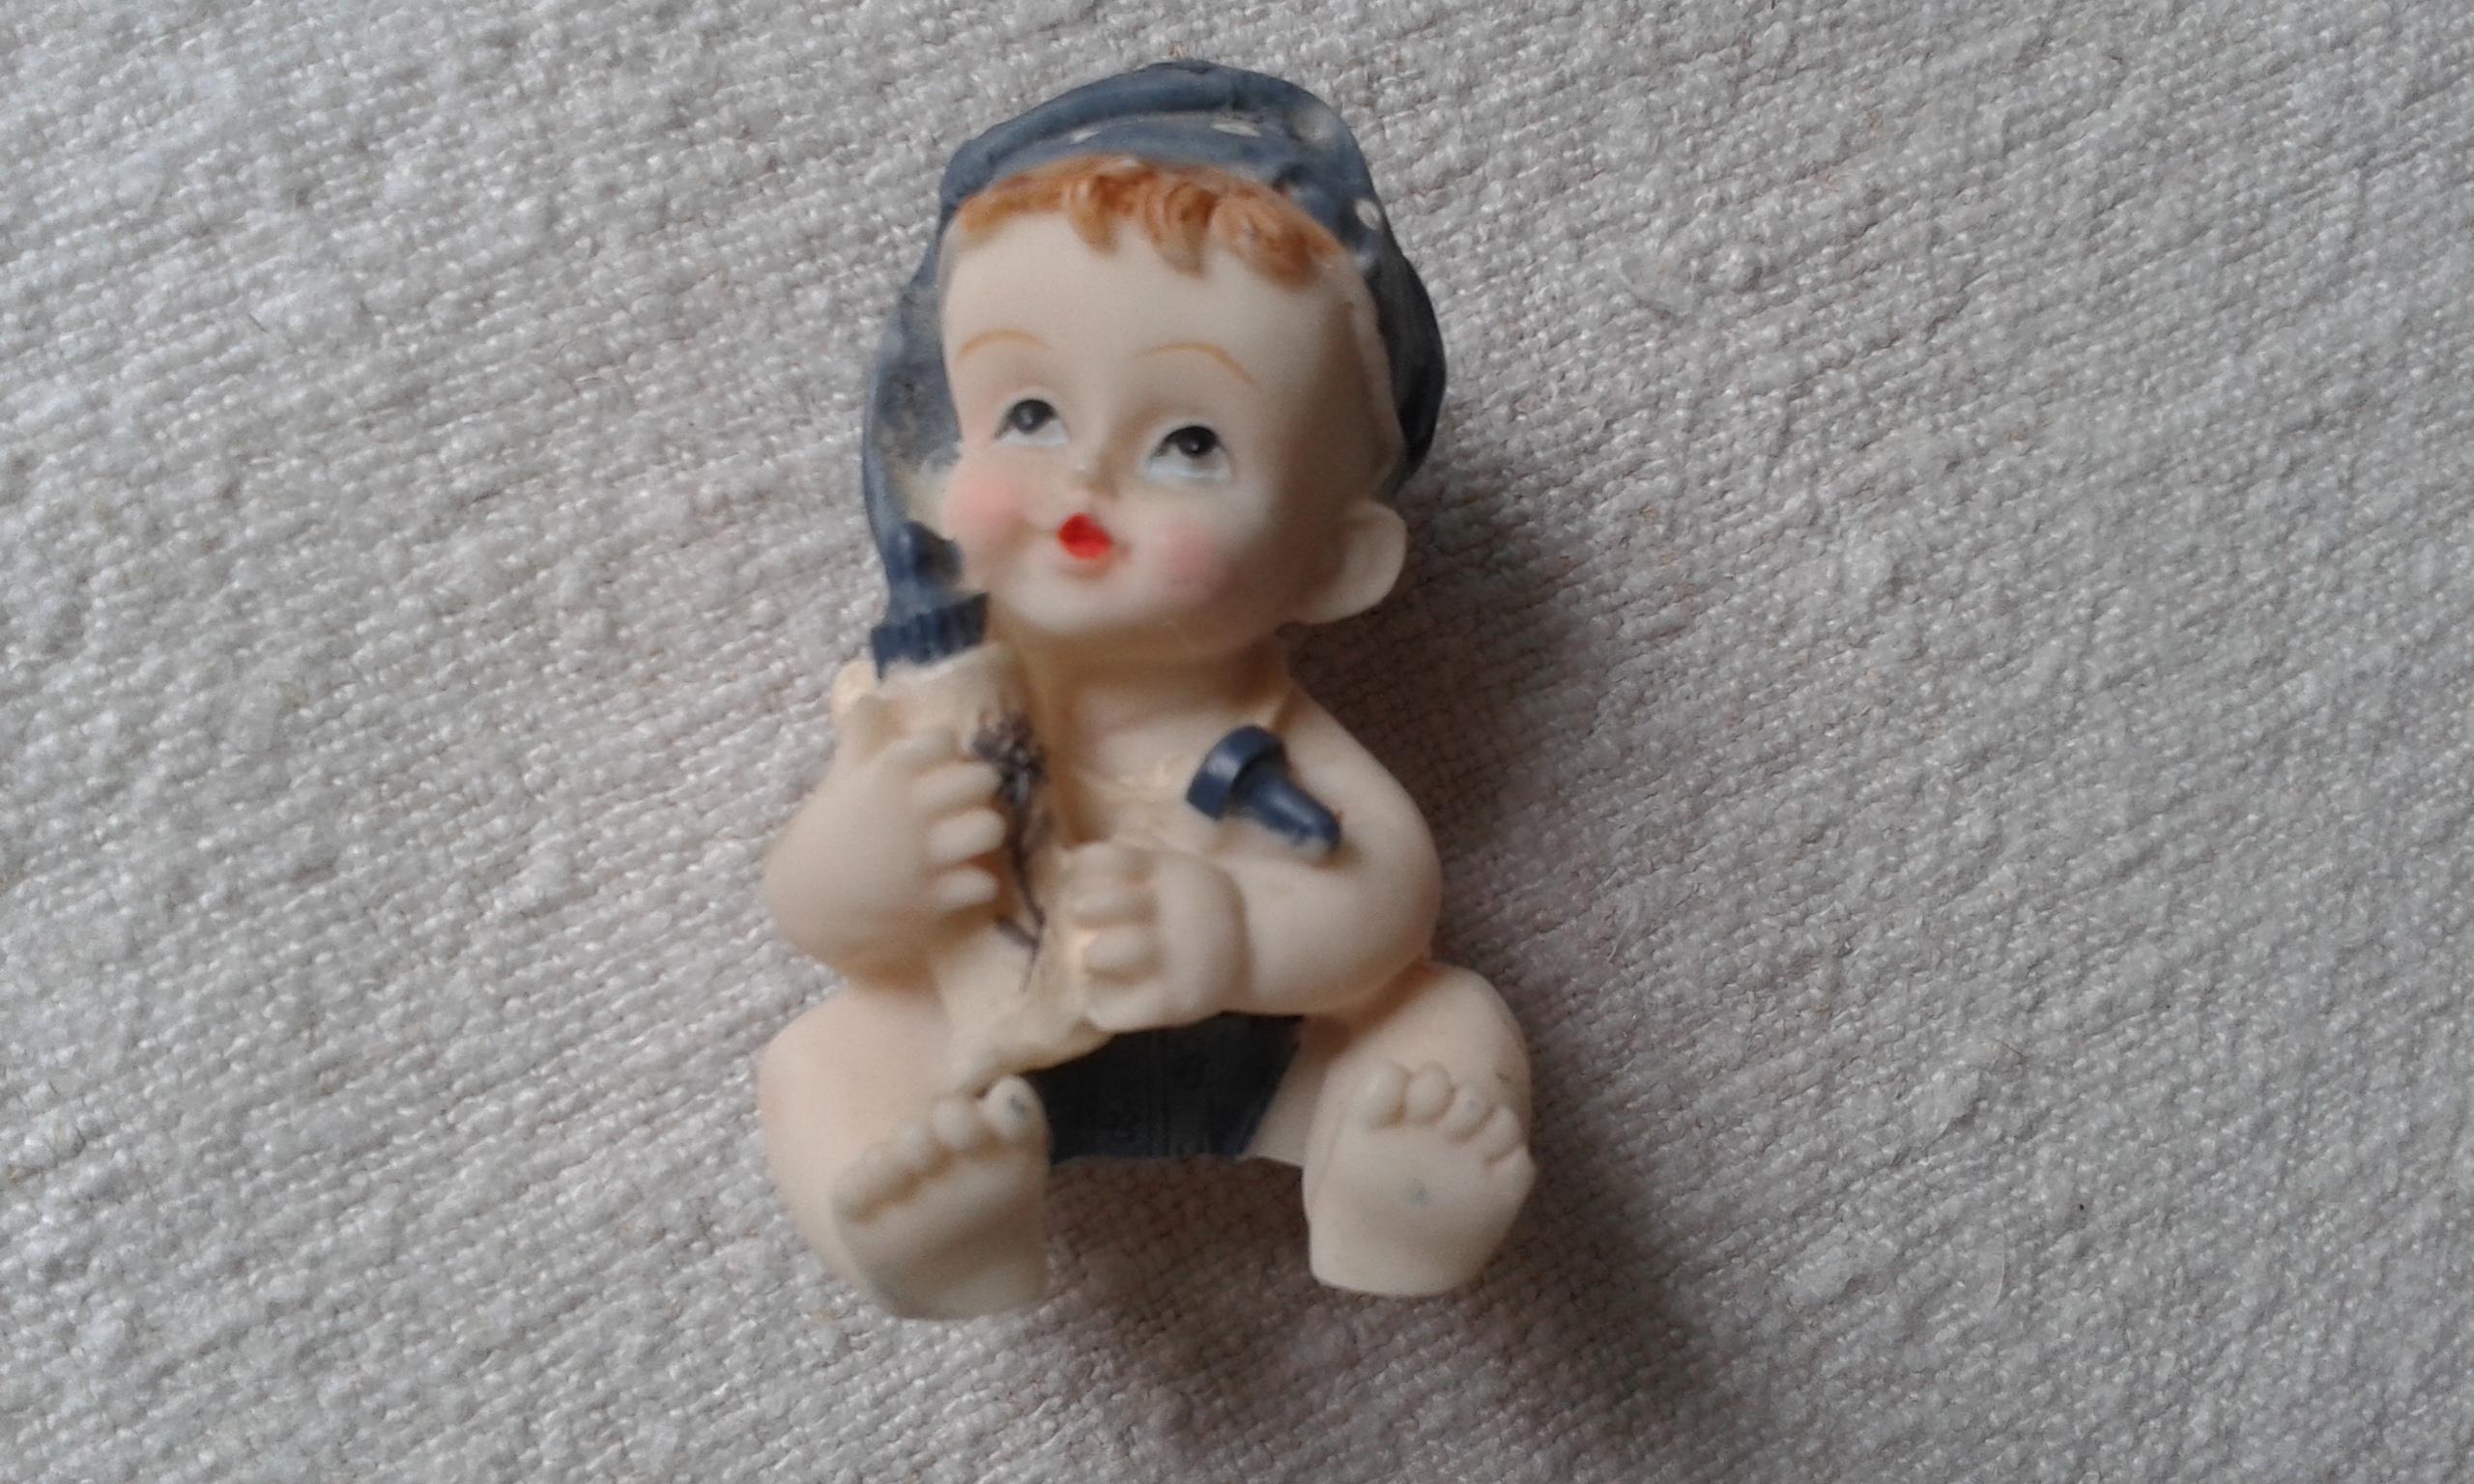 troc de troc joli bibelot bébé et son biberon image 0